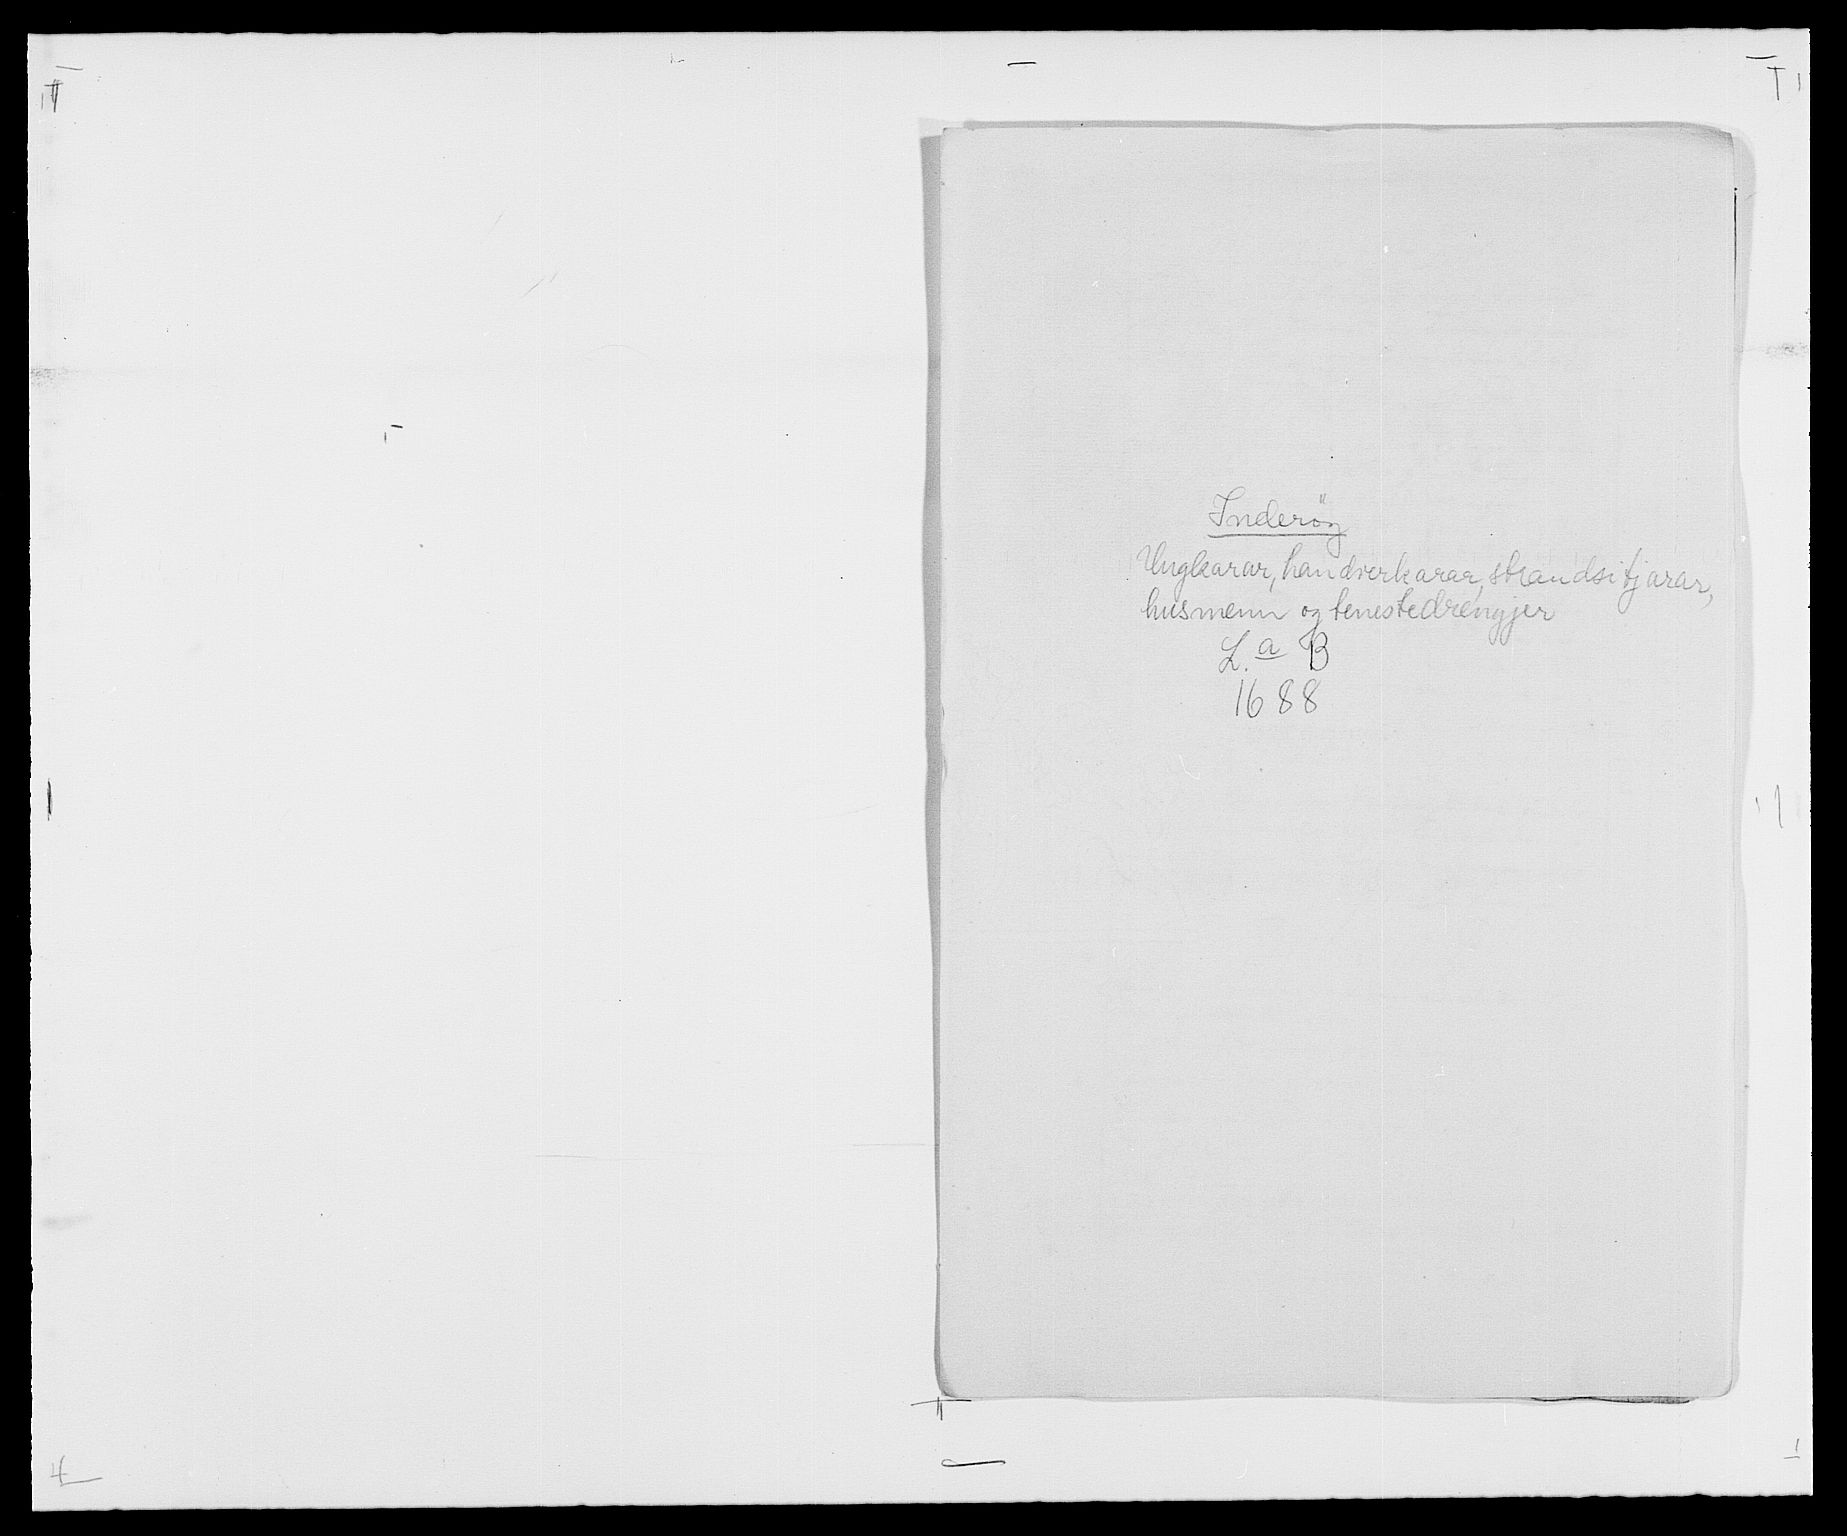 RA, Rentekammeret inntil 1814, Reviderte regnskaper, Fogderegnskap, R63/L4306: Fogderegnskap Inderøy, 1687-1689, s. 245